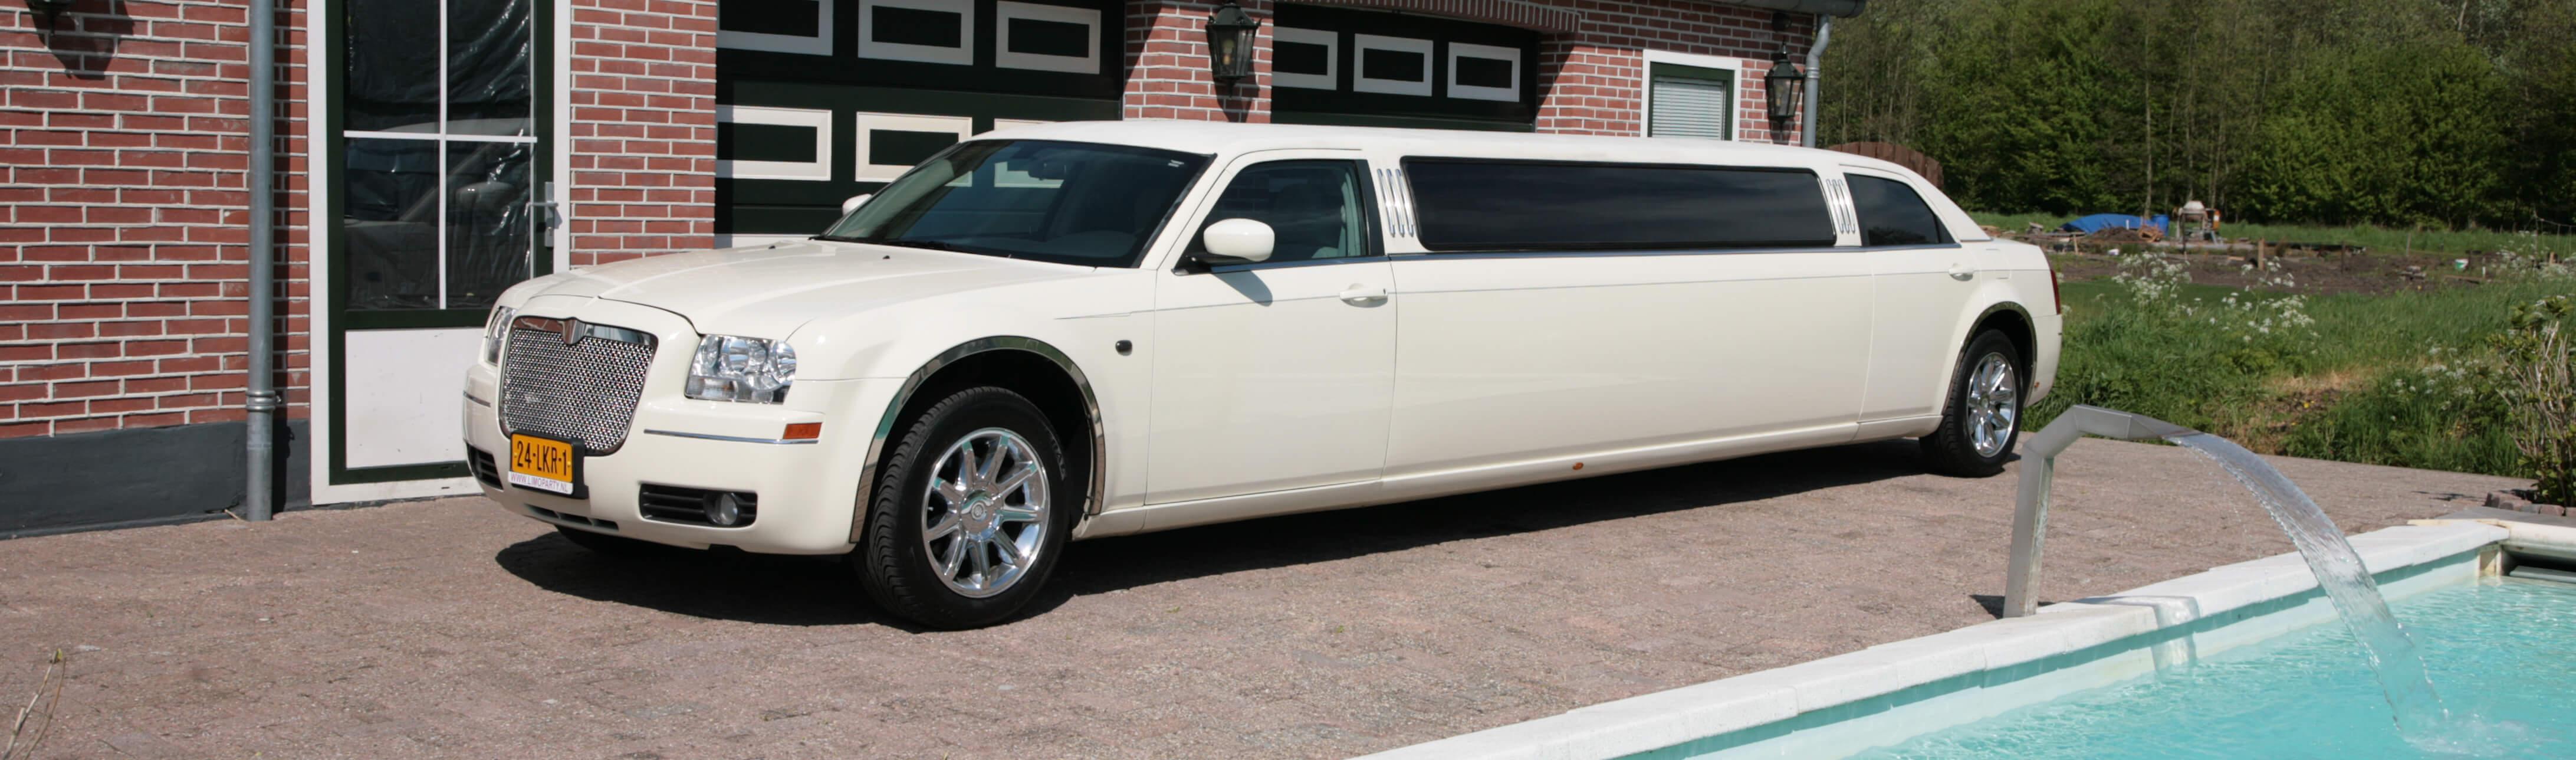 Chrysler 300c limousine huren bij limoparty utrecht